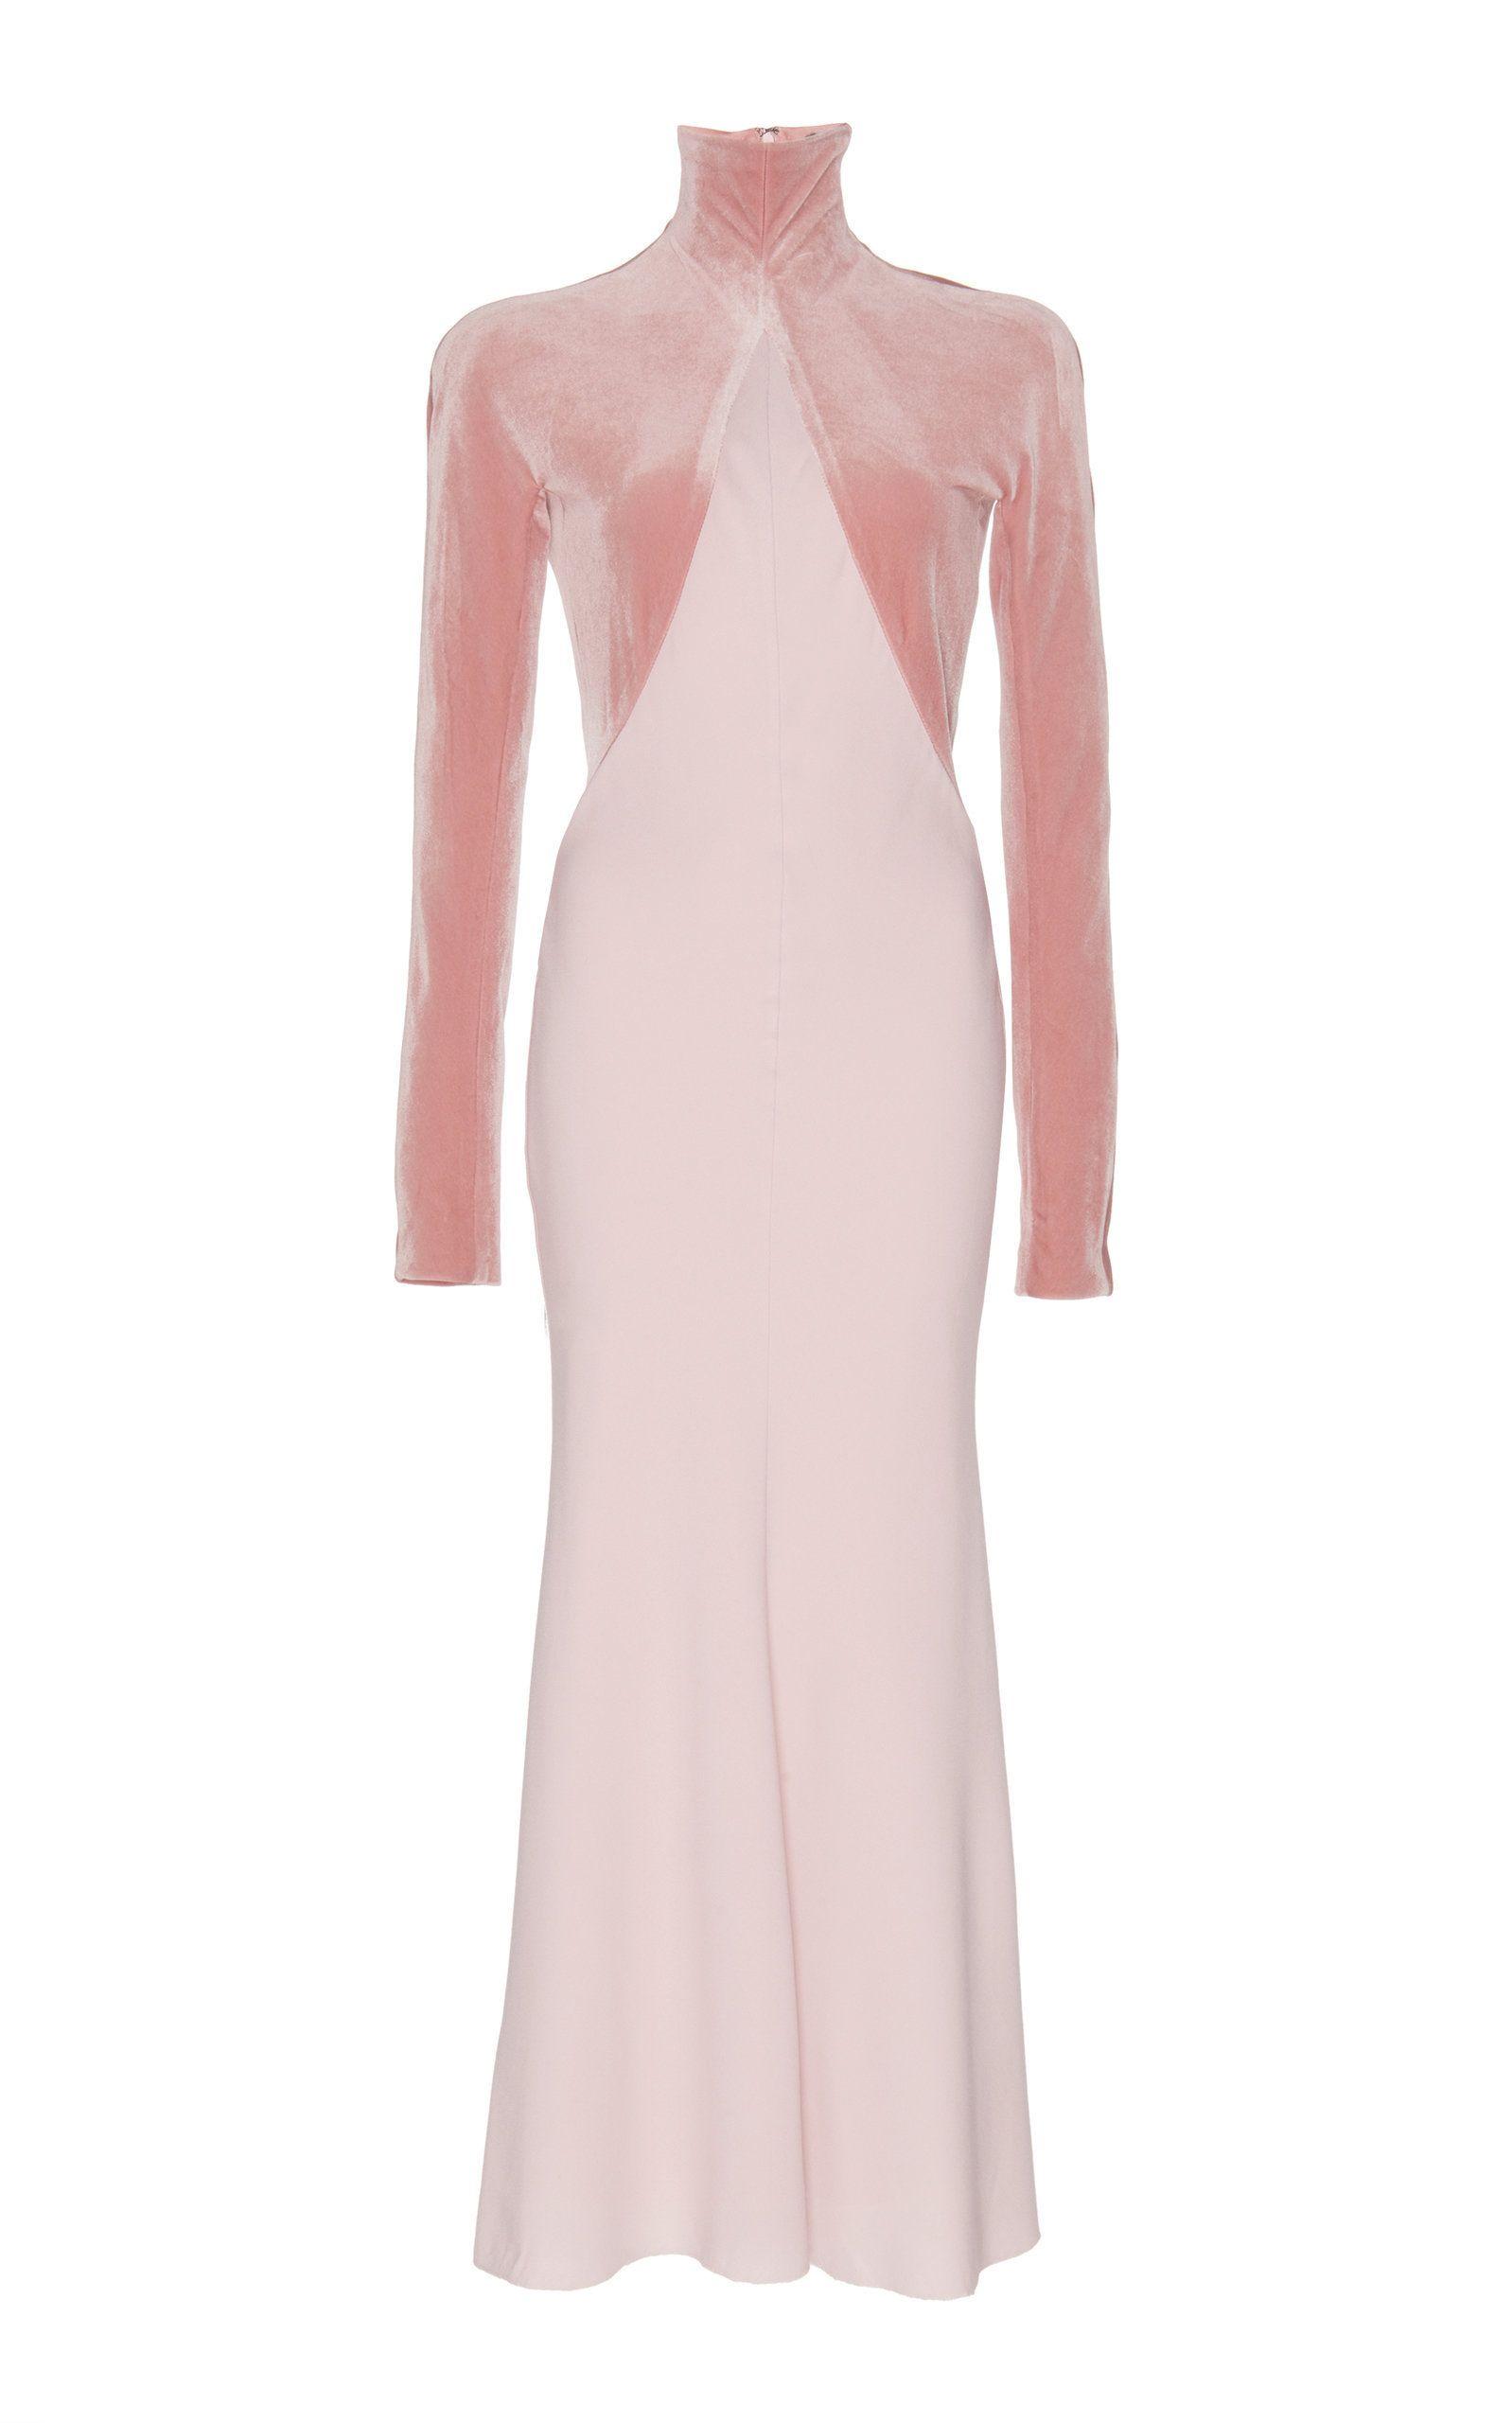 Turtleneck dress by Haider Ackermann   Playing Dress-Up   Pinterest ...